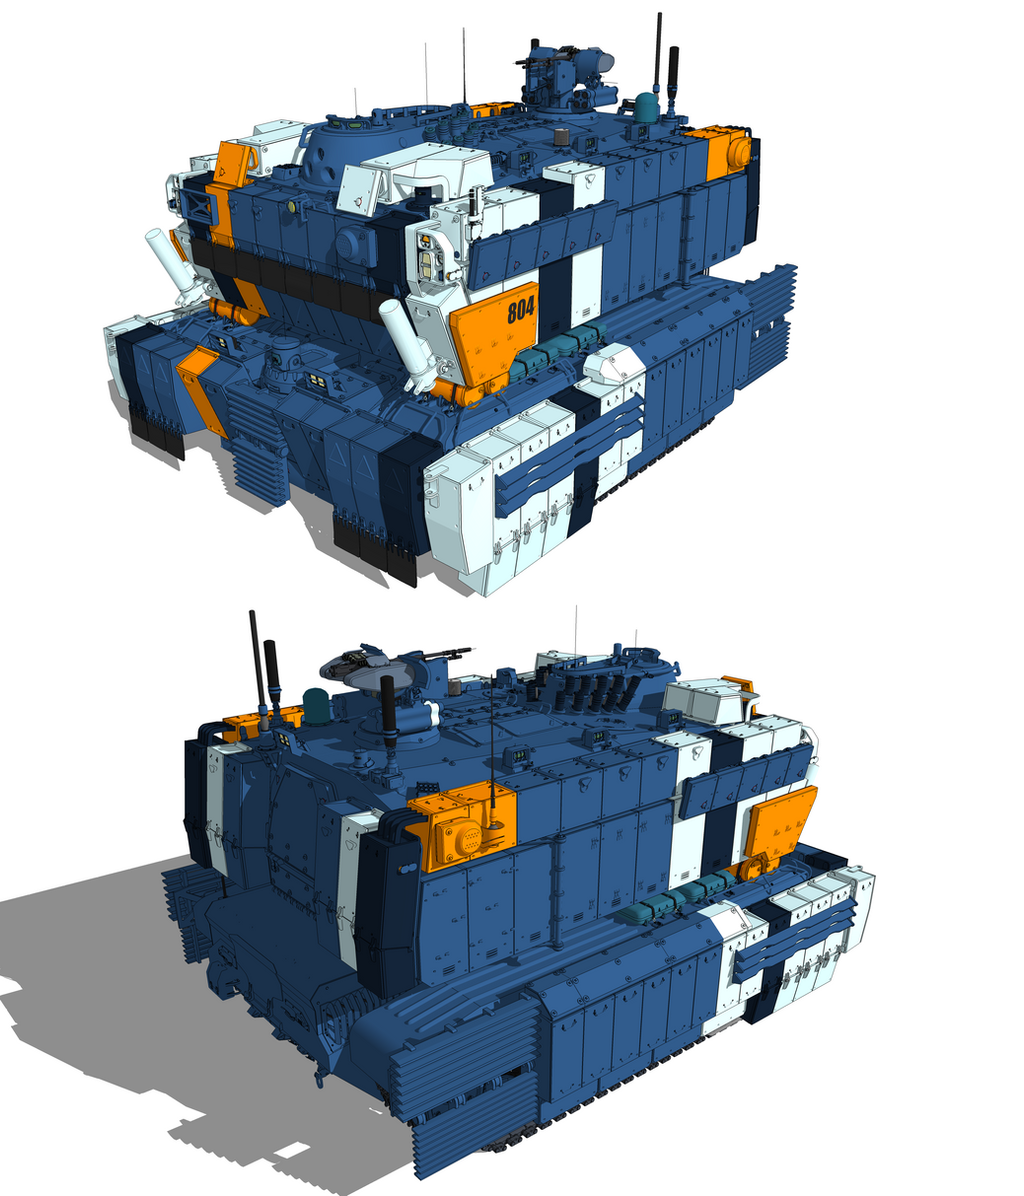 Base vehicle concept by flaketom